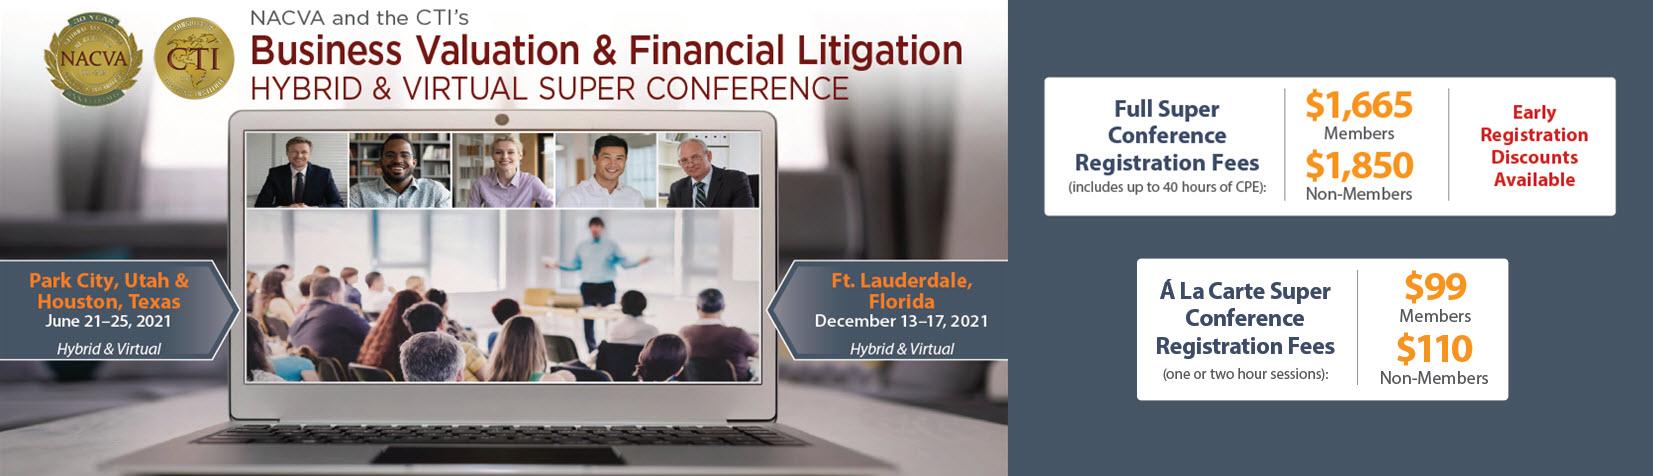 2021 Business Valuation & Financial Litigation Hybrid & Virtual Super Conference   June 21–25, 2021